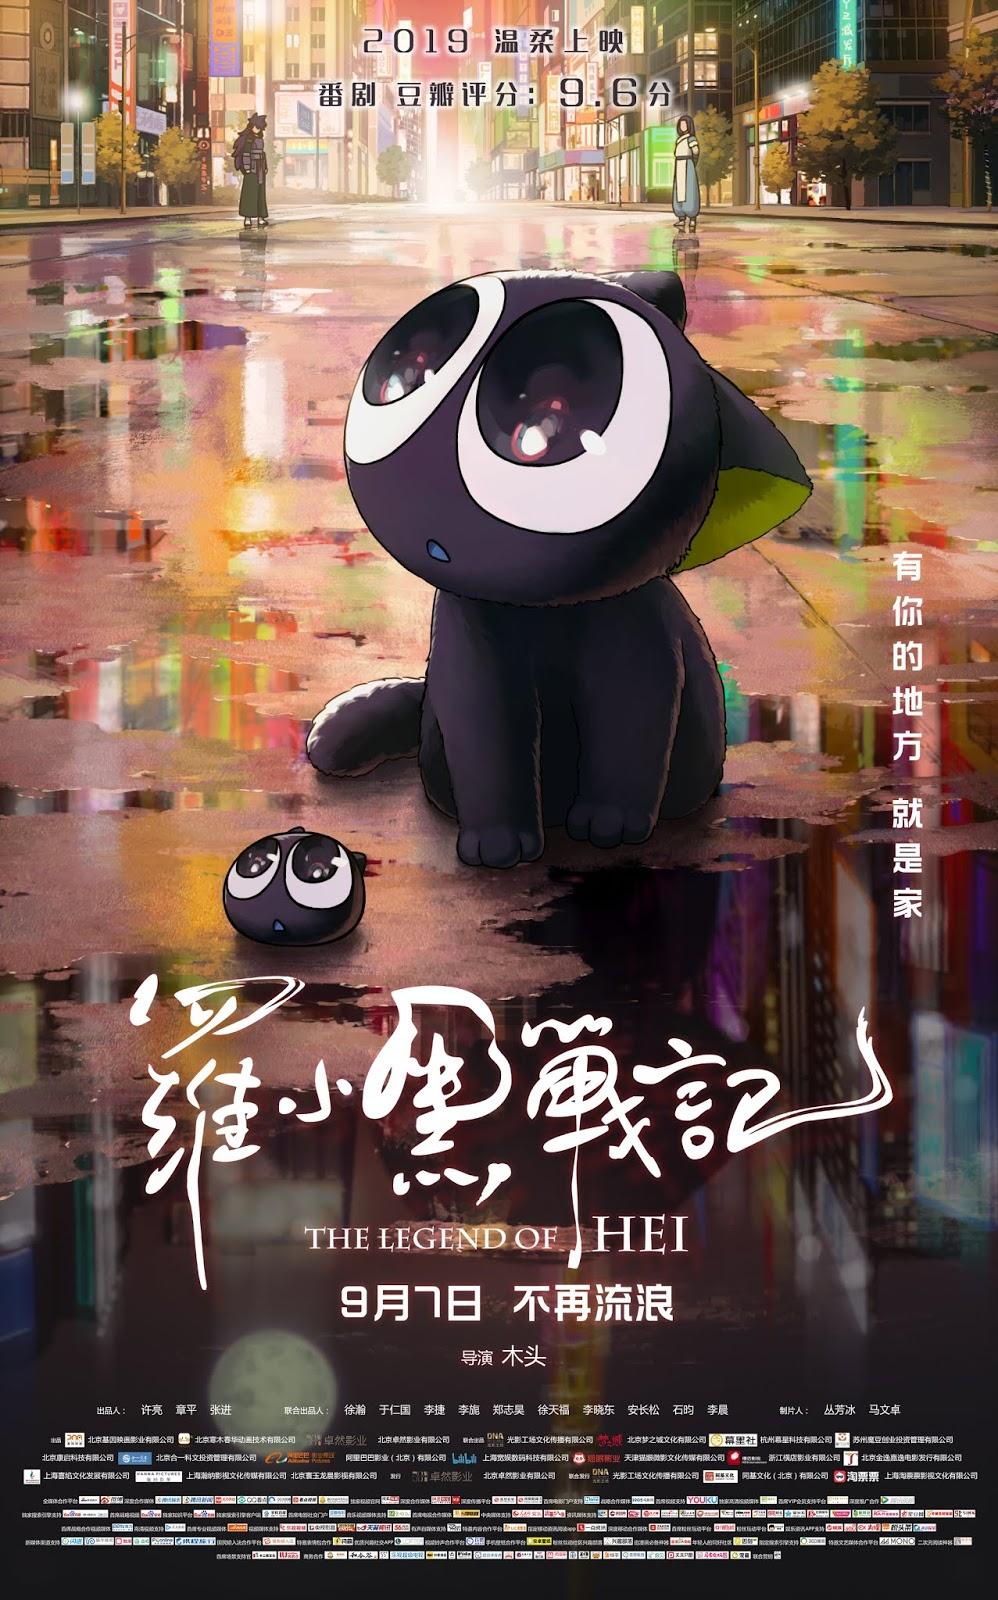 Huyền Thoại La Tiểu Hắc - The Legend of Hei